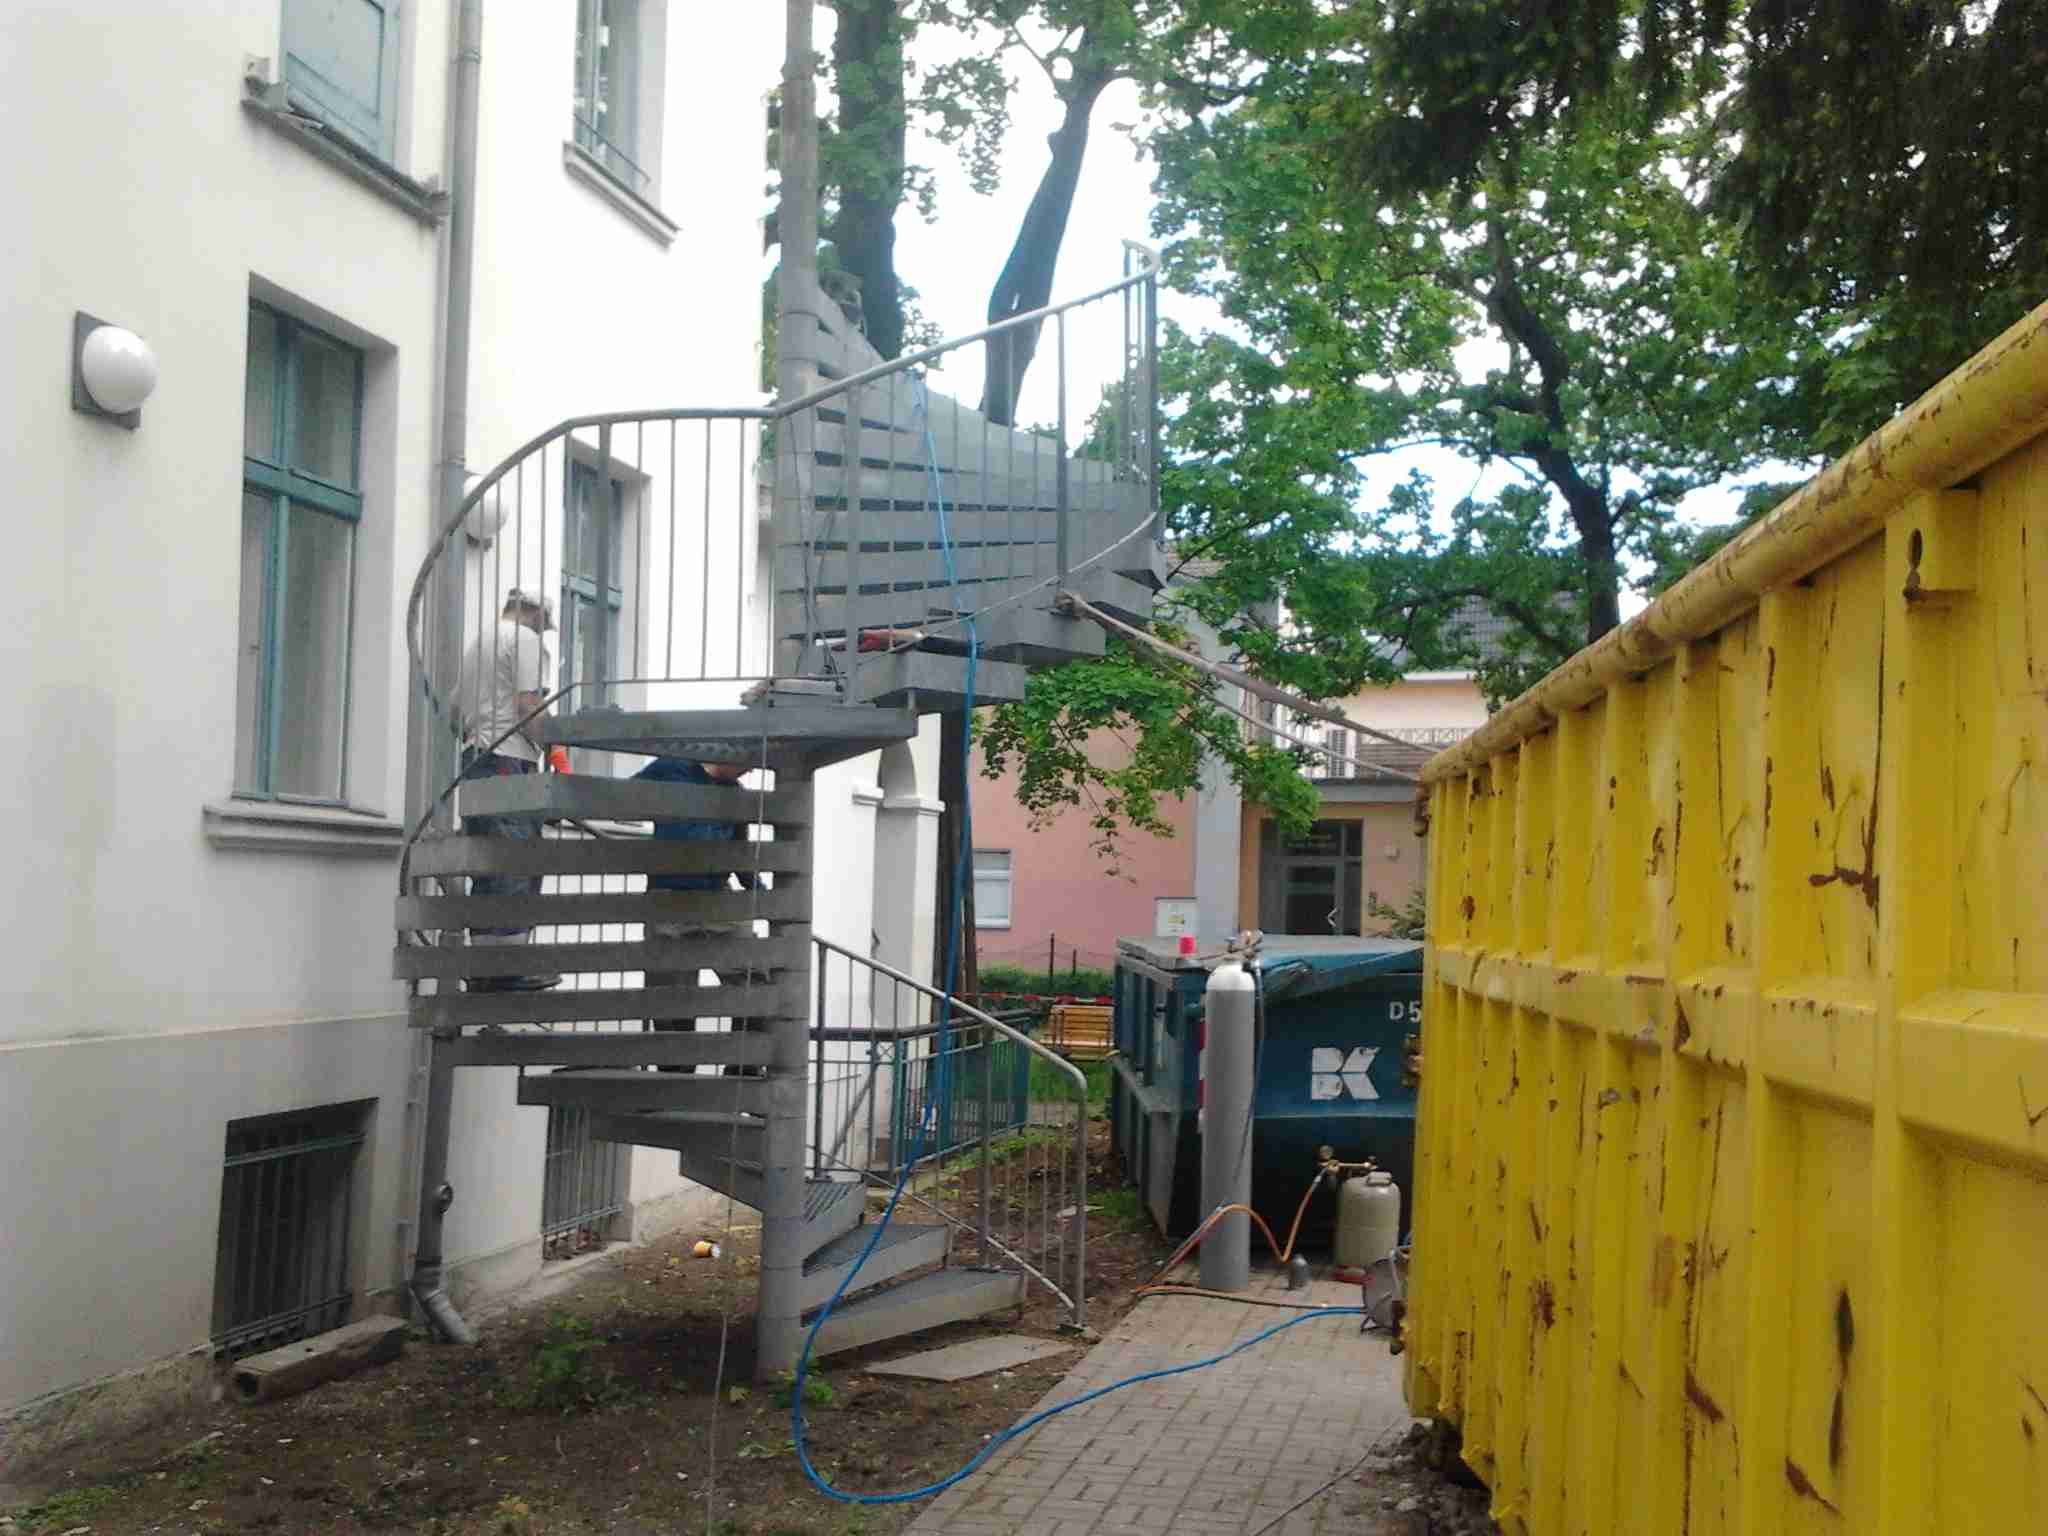 demontage oder abriss berlin brandenburg. Black Bedroom Furniture Sets. Home Design Ideas